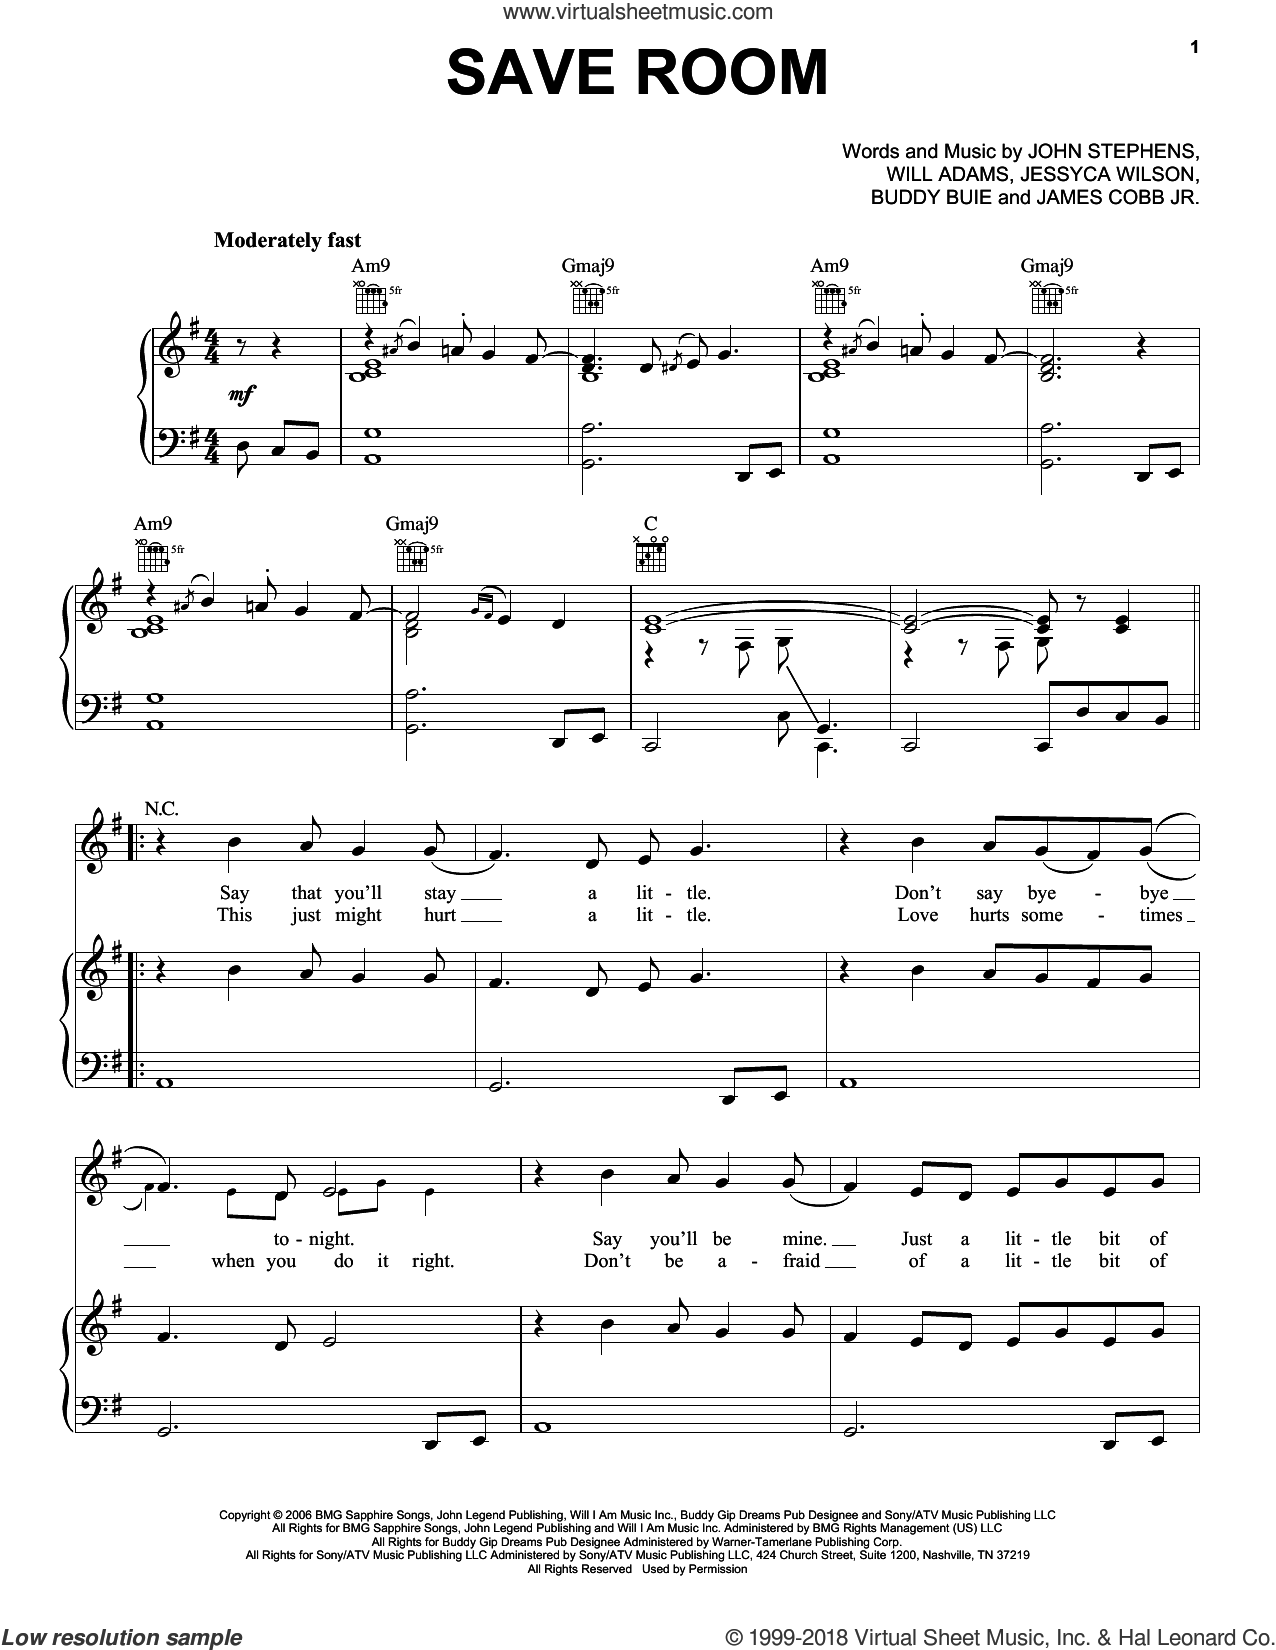 Save Room sheet music for voice, piano or guitar by John Legend, Buddy Buie, James Cobb Jr., Jessyca Wilson, John Stephens and Will Adams, intermediate skill level